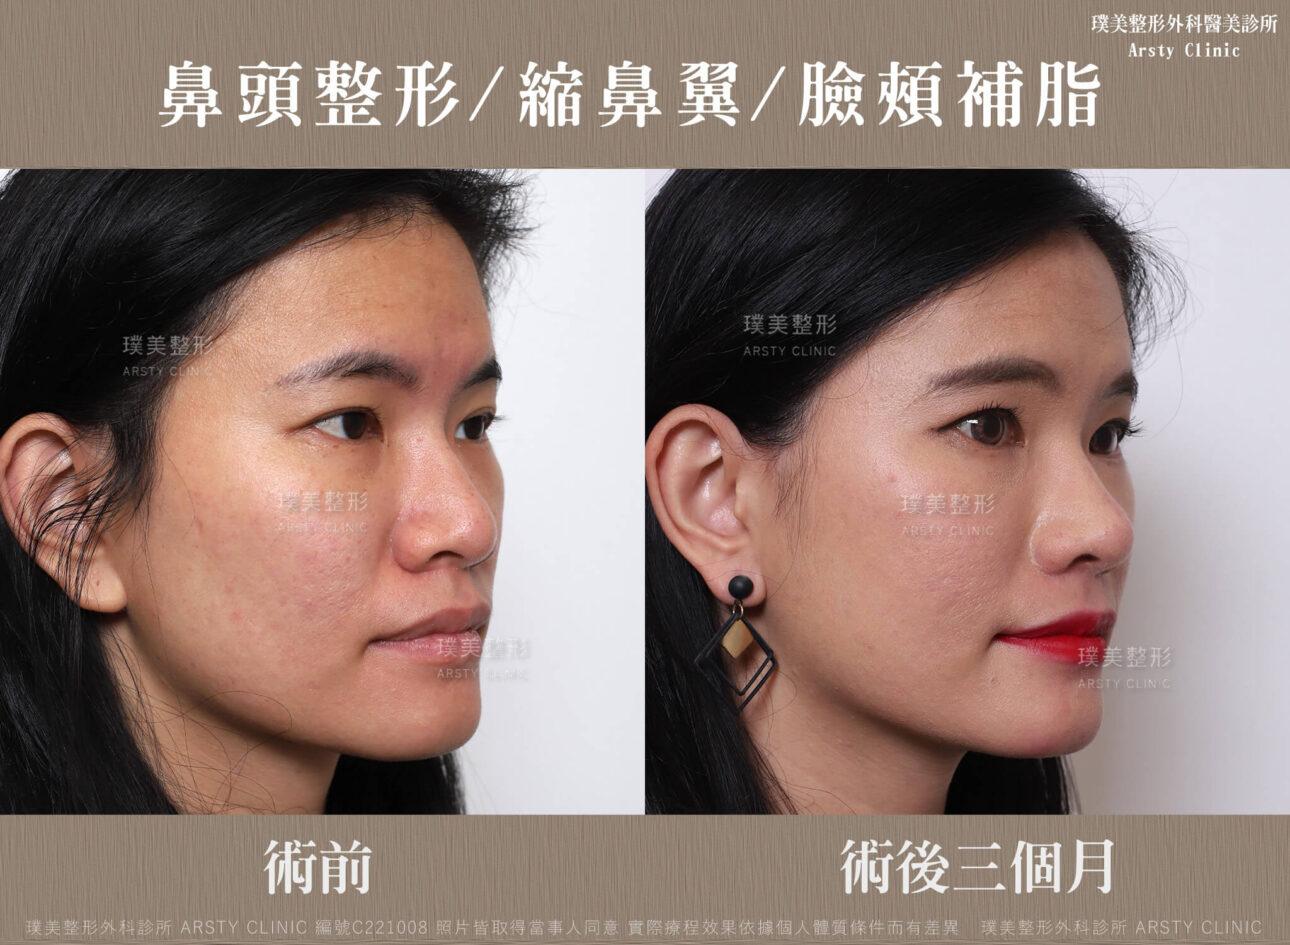 鼻頭整形 縮鼻翼 臉頰補脂 C221008BA3M04